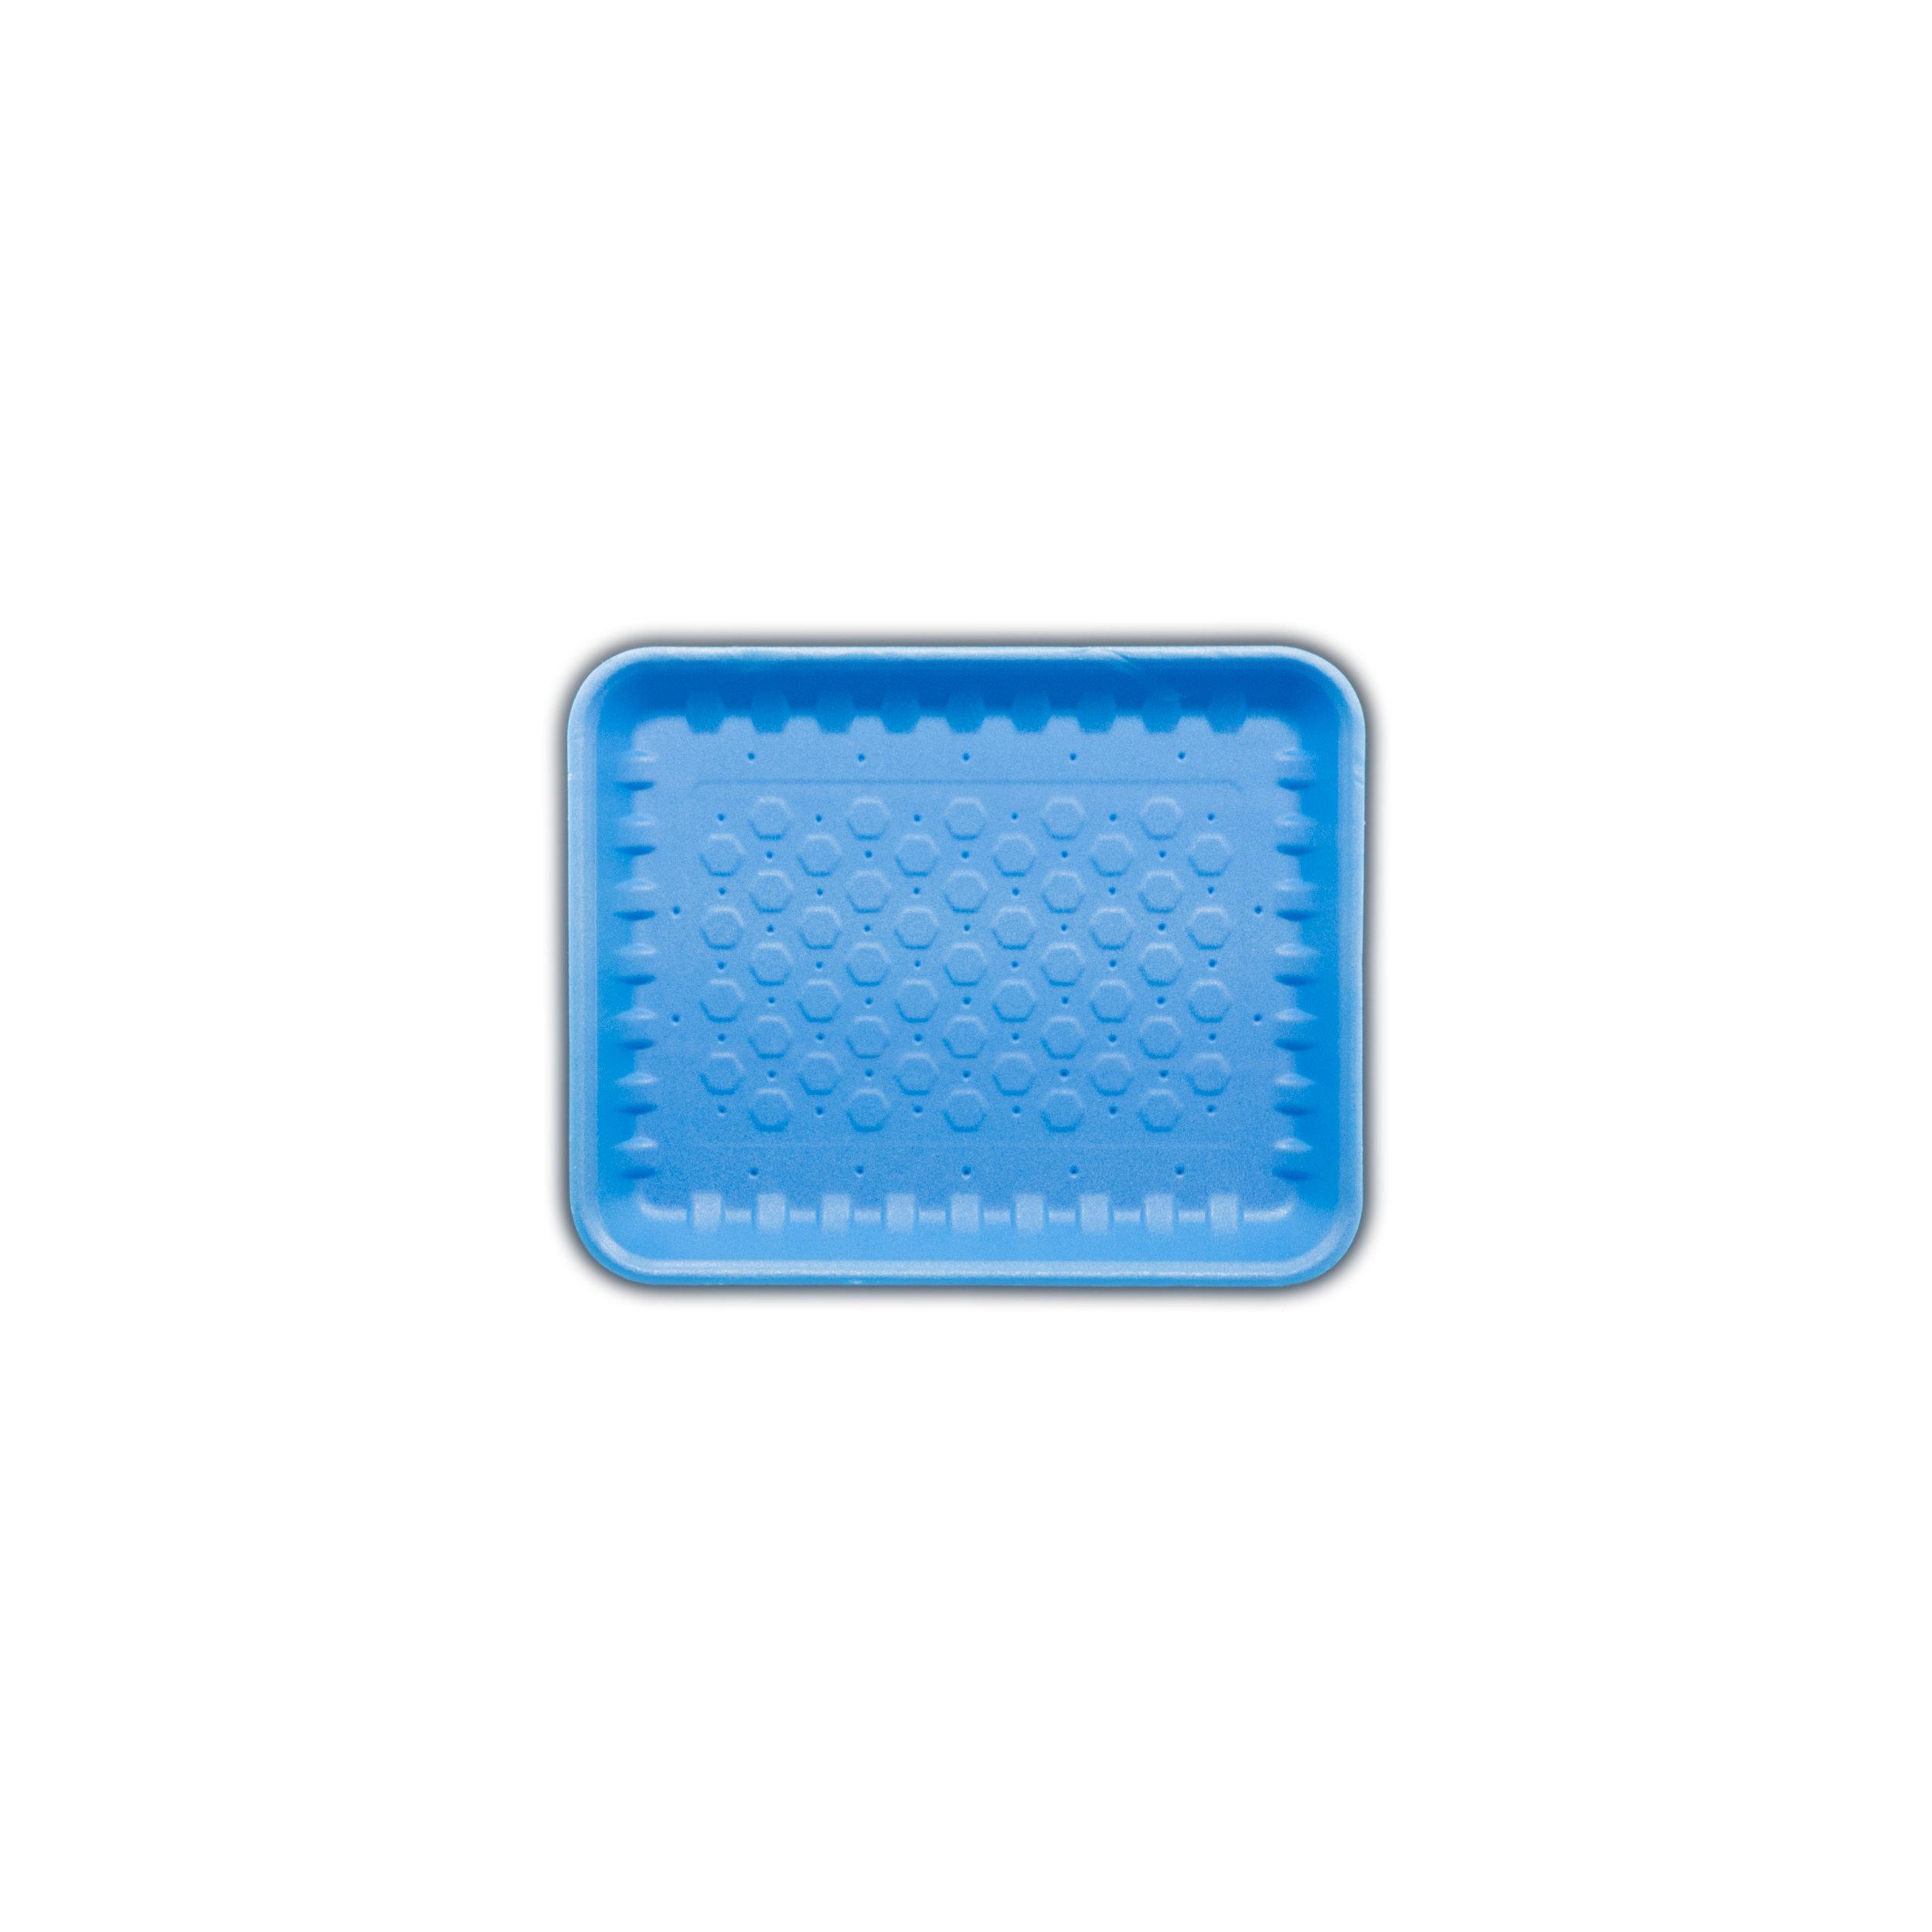 iK-0634      OPEN CELL 25mm blue 10x8    90 per sleeve 360 per carton